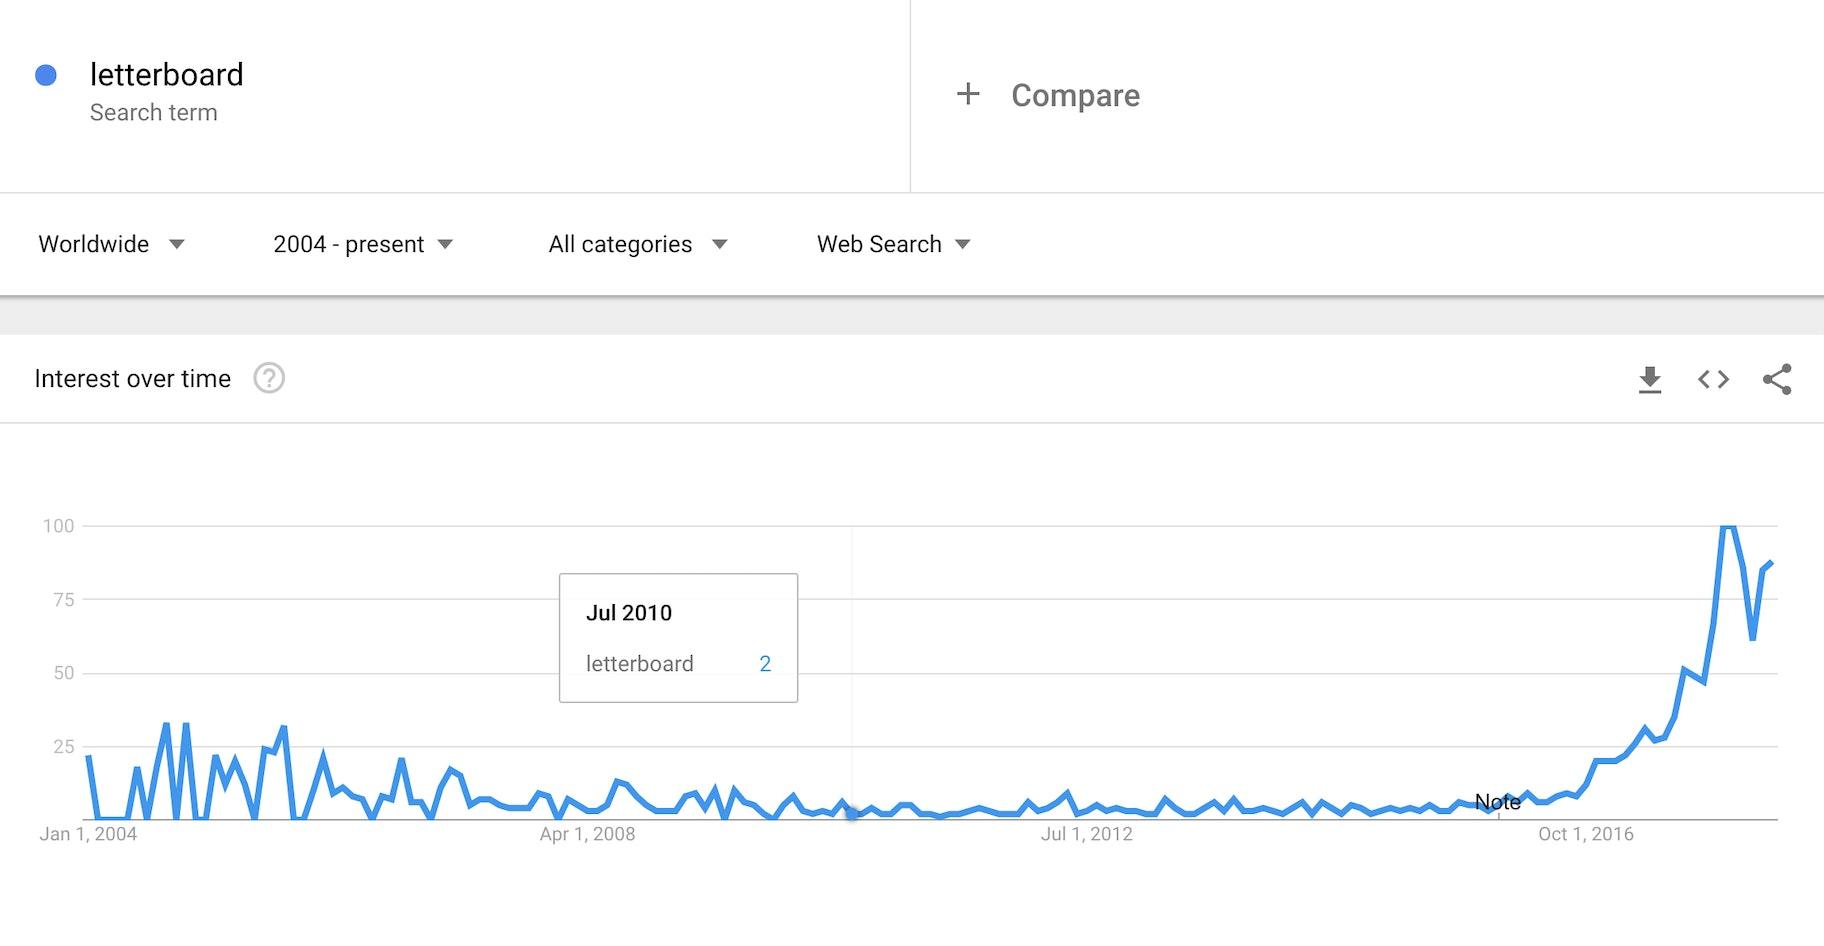 letterboard - google trends